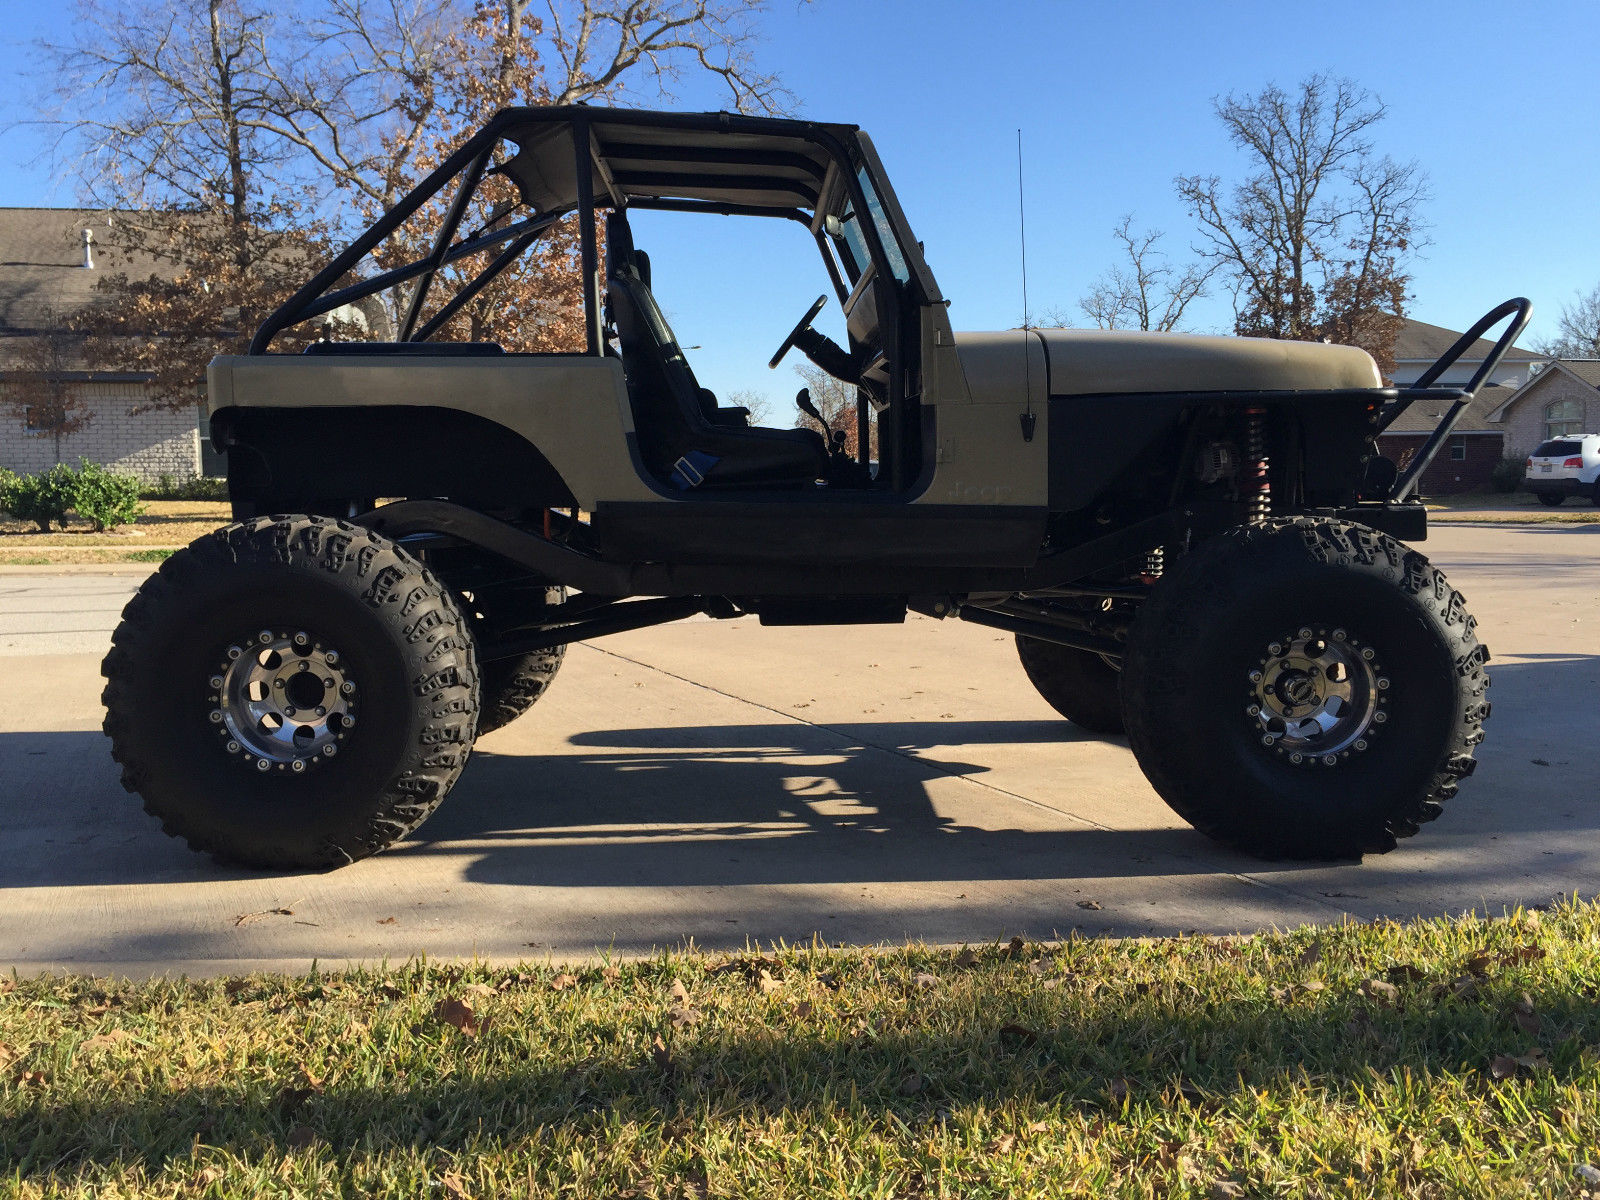 Jeep Wrangler Tj Build >> 1992 Jeep Wrangler YJ Custom Rock Crawler Street Legal for sale in College Station, Texas ...